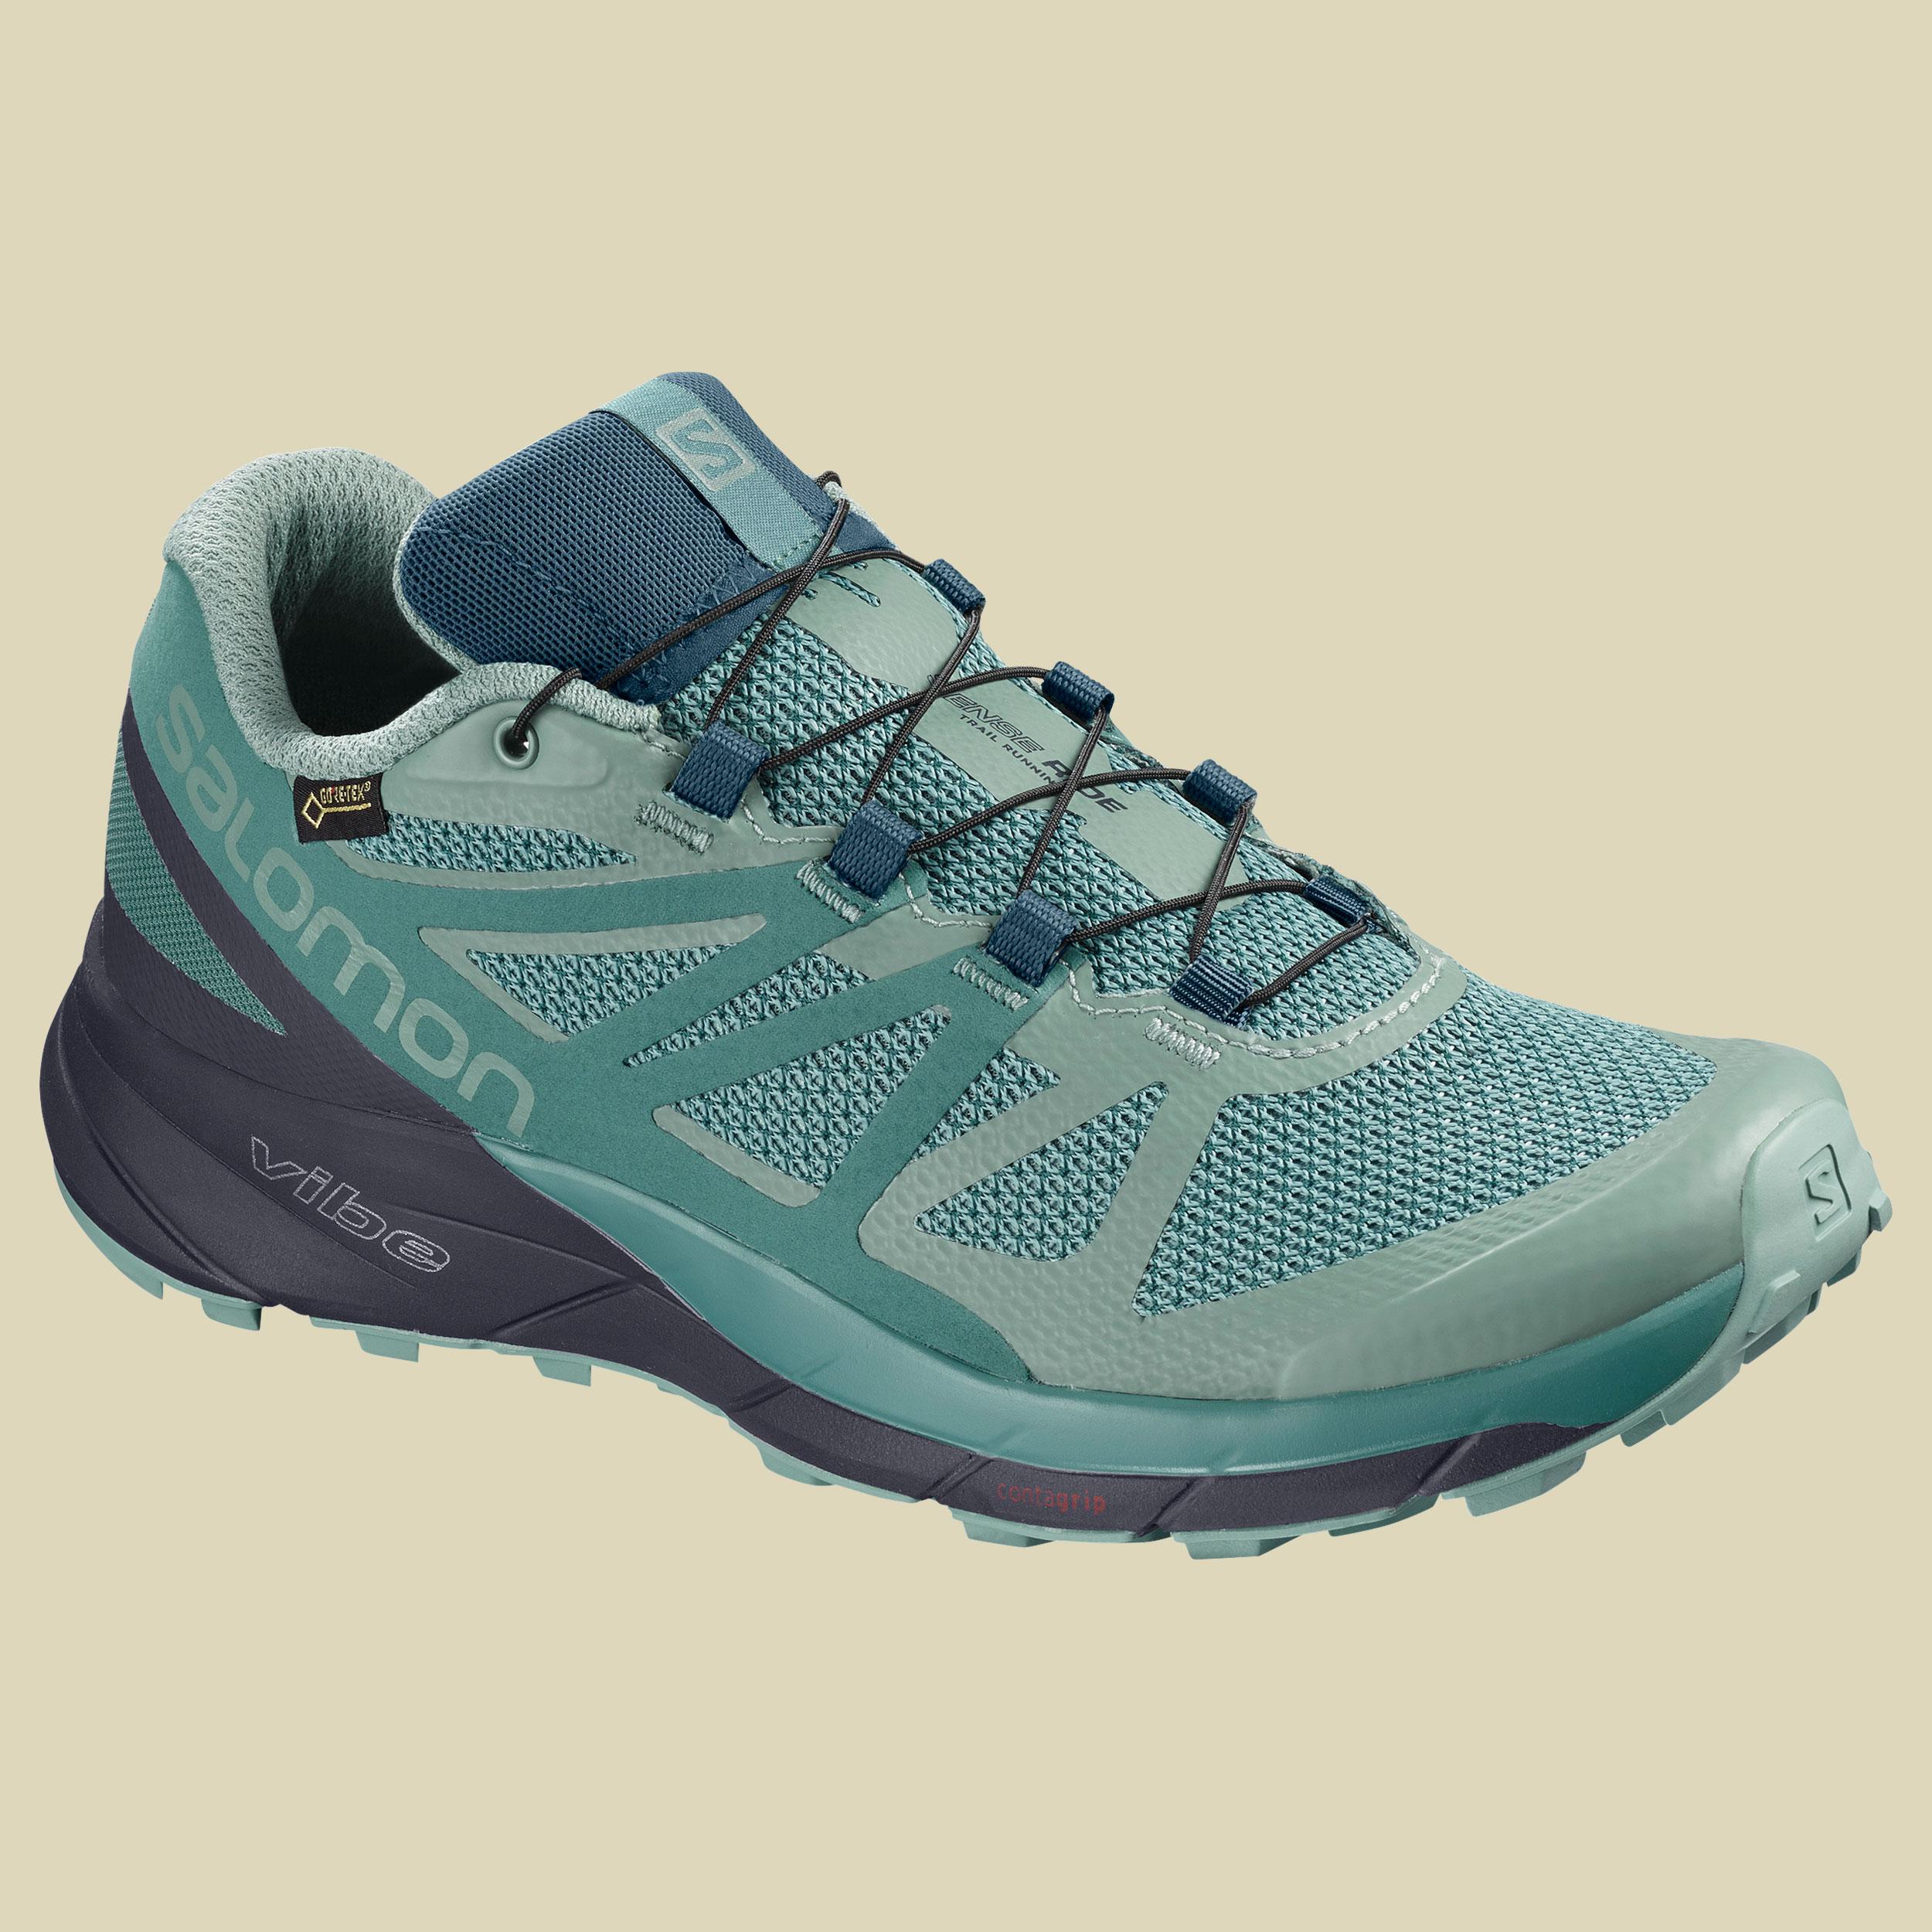 Salomon Sense Ride GTX Invisible Fit Women Damen Laufschuh Größe UK 5 trellis/graphite